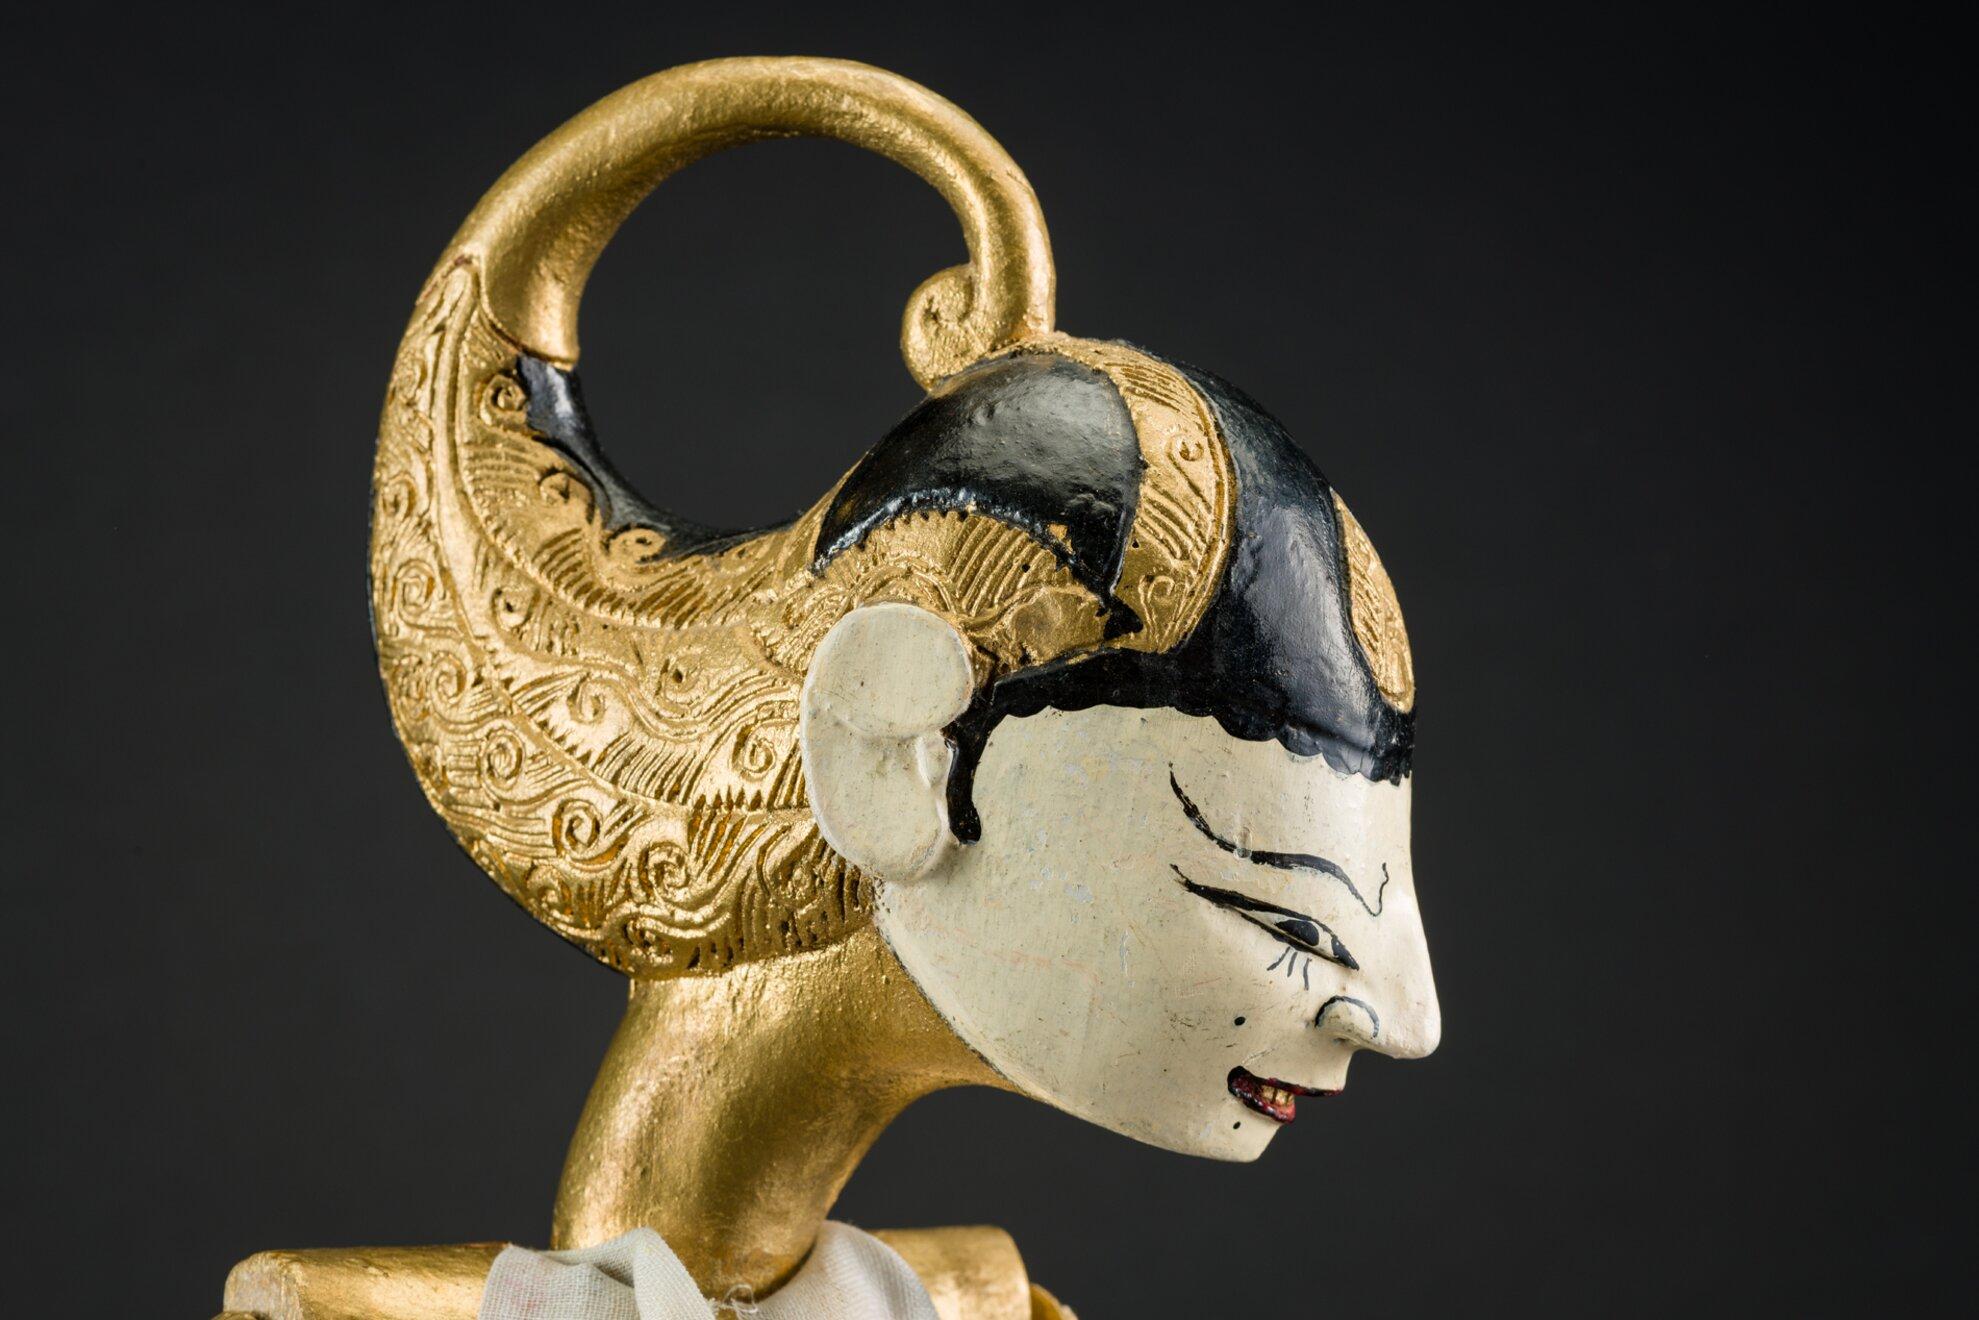 Made in Asia. Százéves a Hopp Múzeum